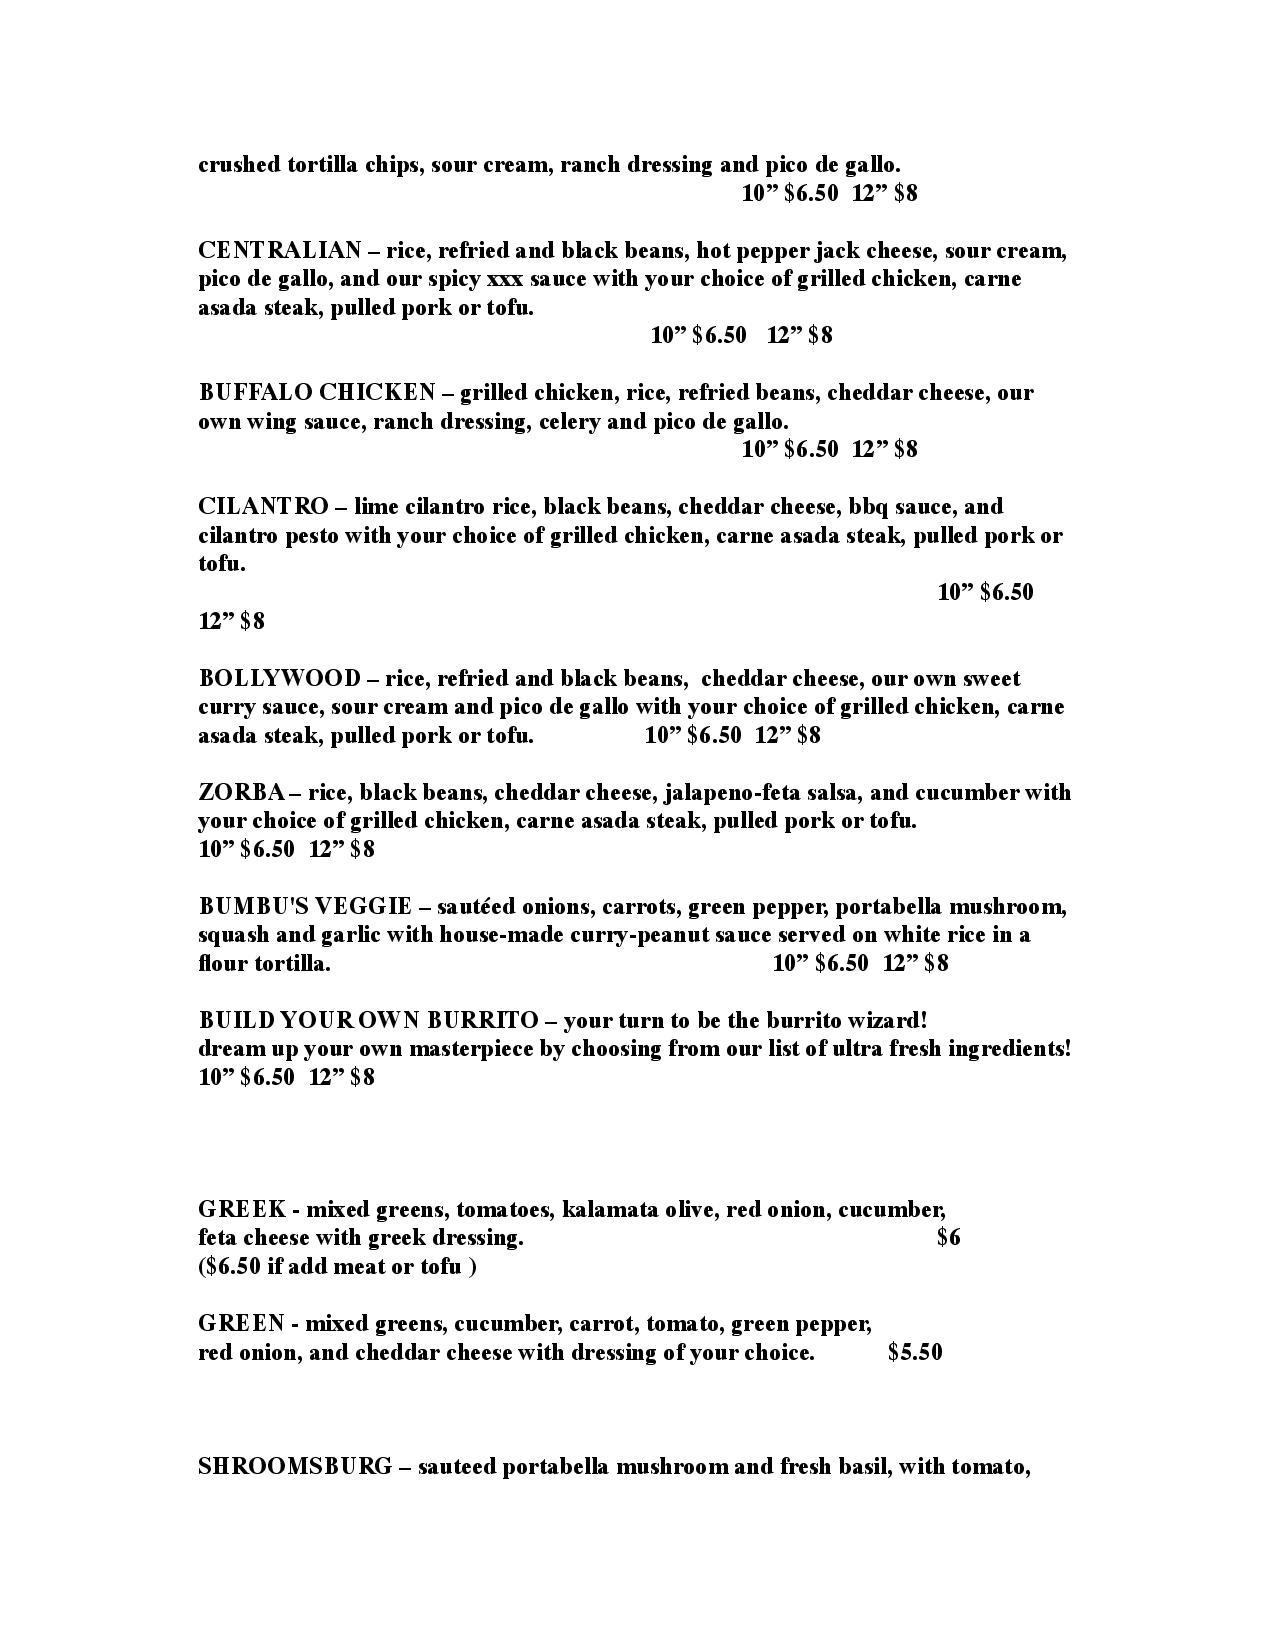 rgb-page-002